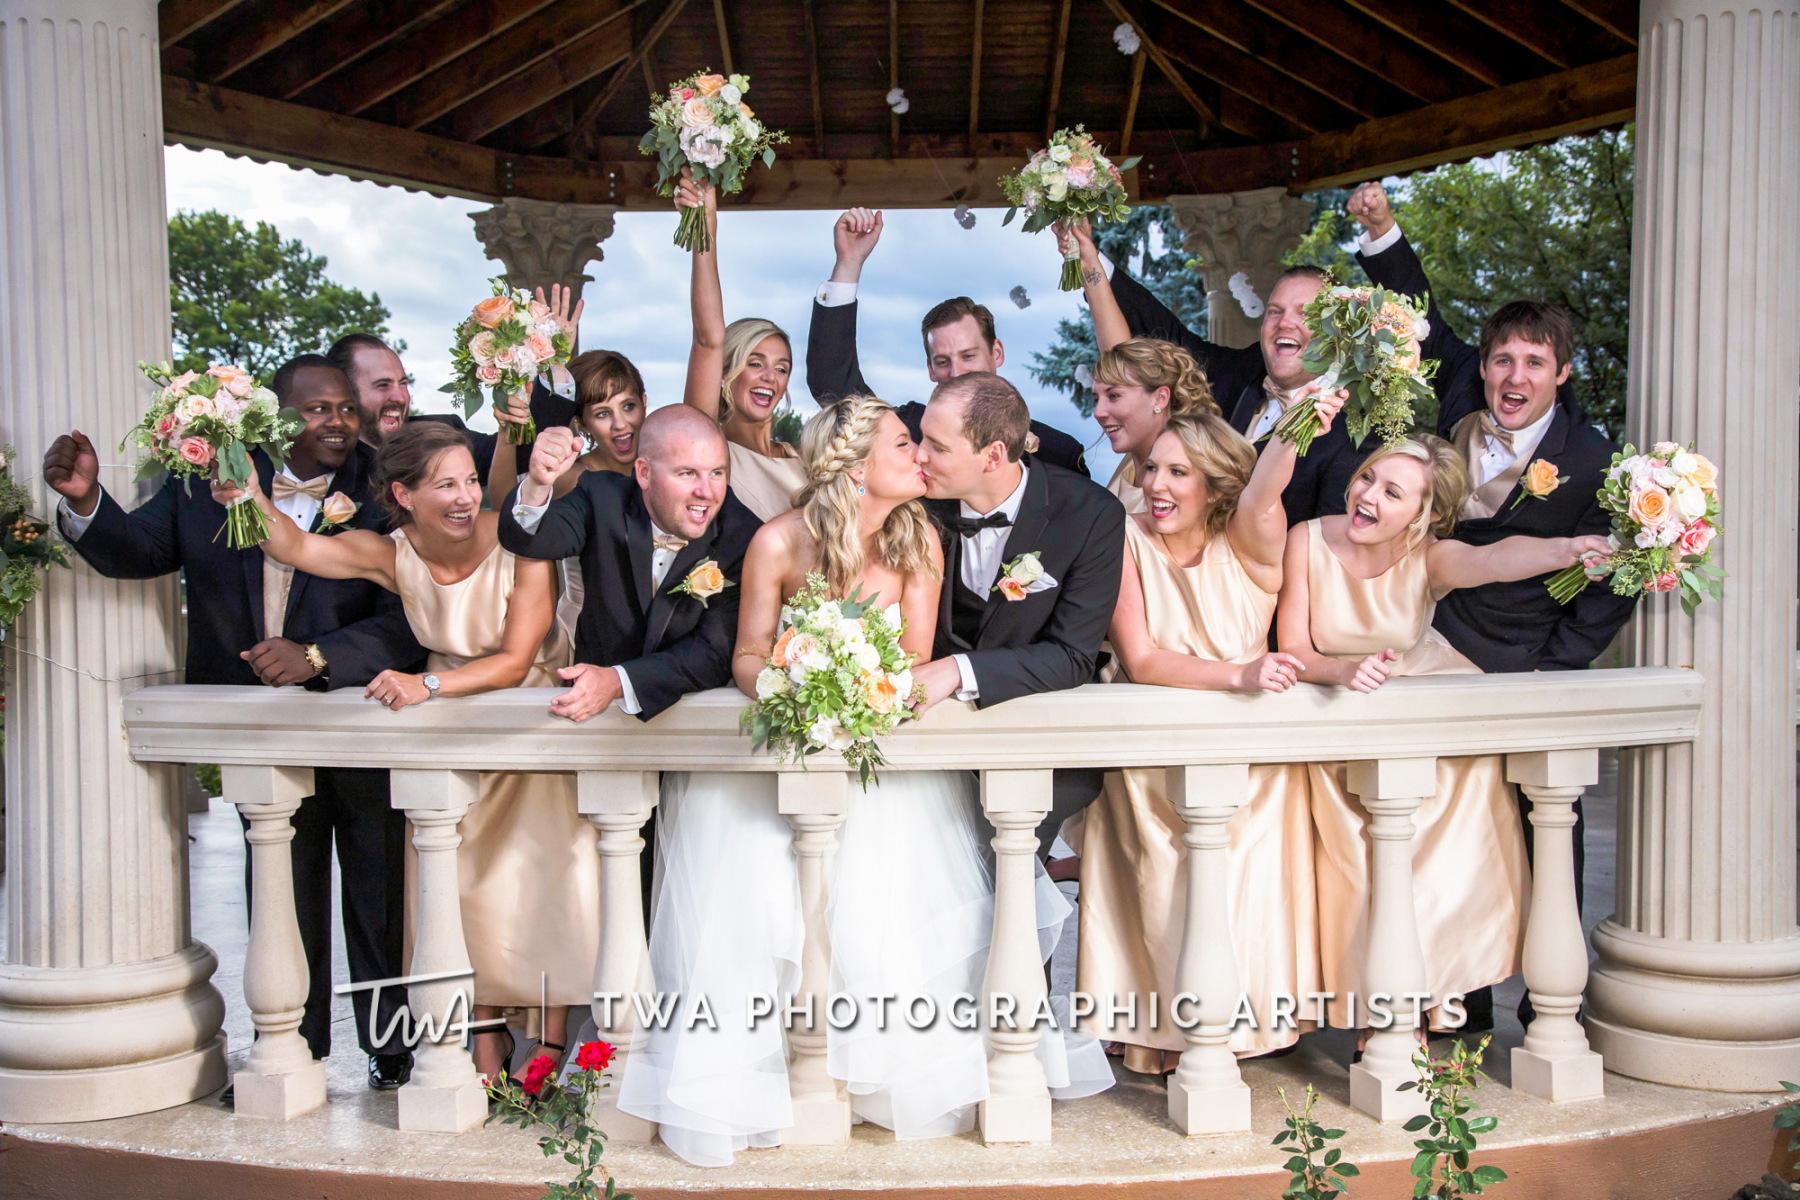 Chicago-Wedding-Photographer-TWA-Photographic-Artists-Drake-Oak-Brook_Poynter_Kesler_SG-0377